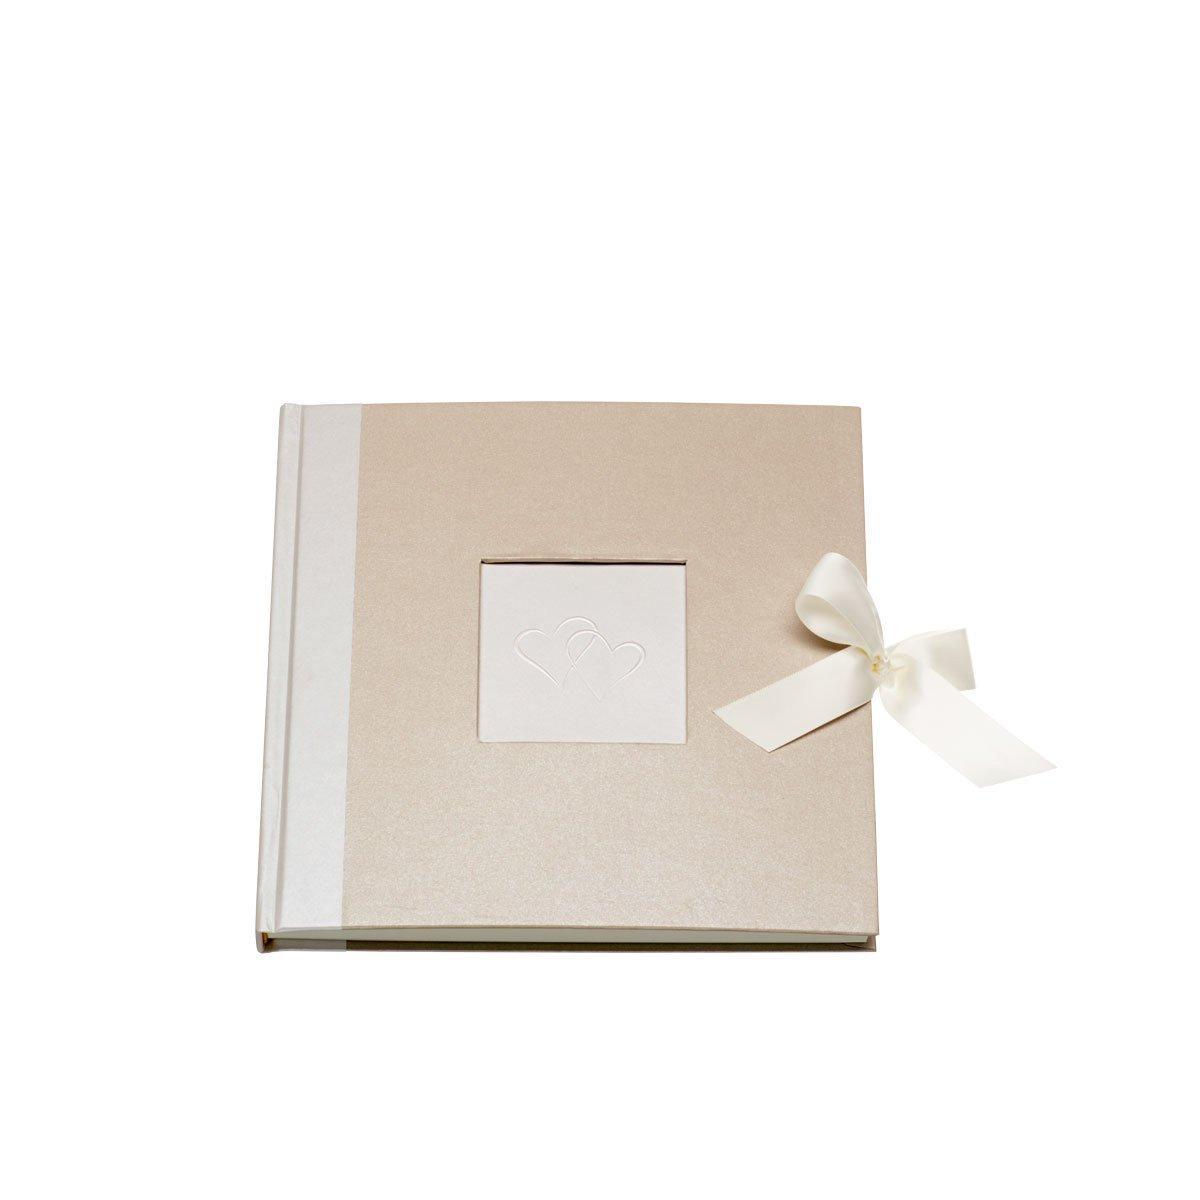 colore: Avorio 192 pagine 21 x 21 cm Libro degli ospiti Forever R/össler Papier 18781002124